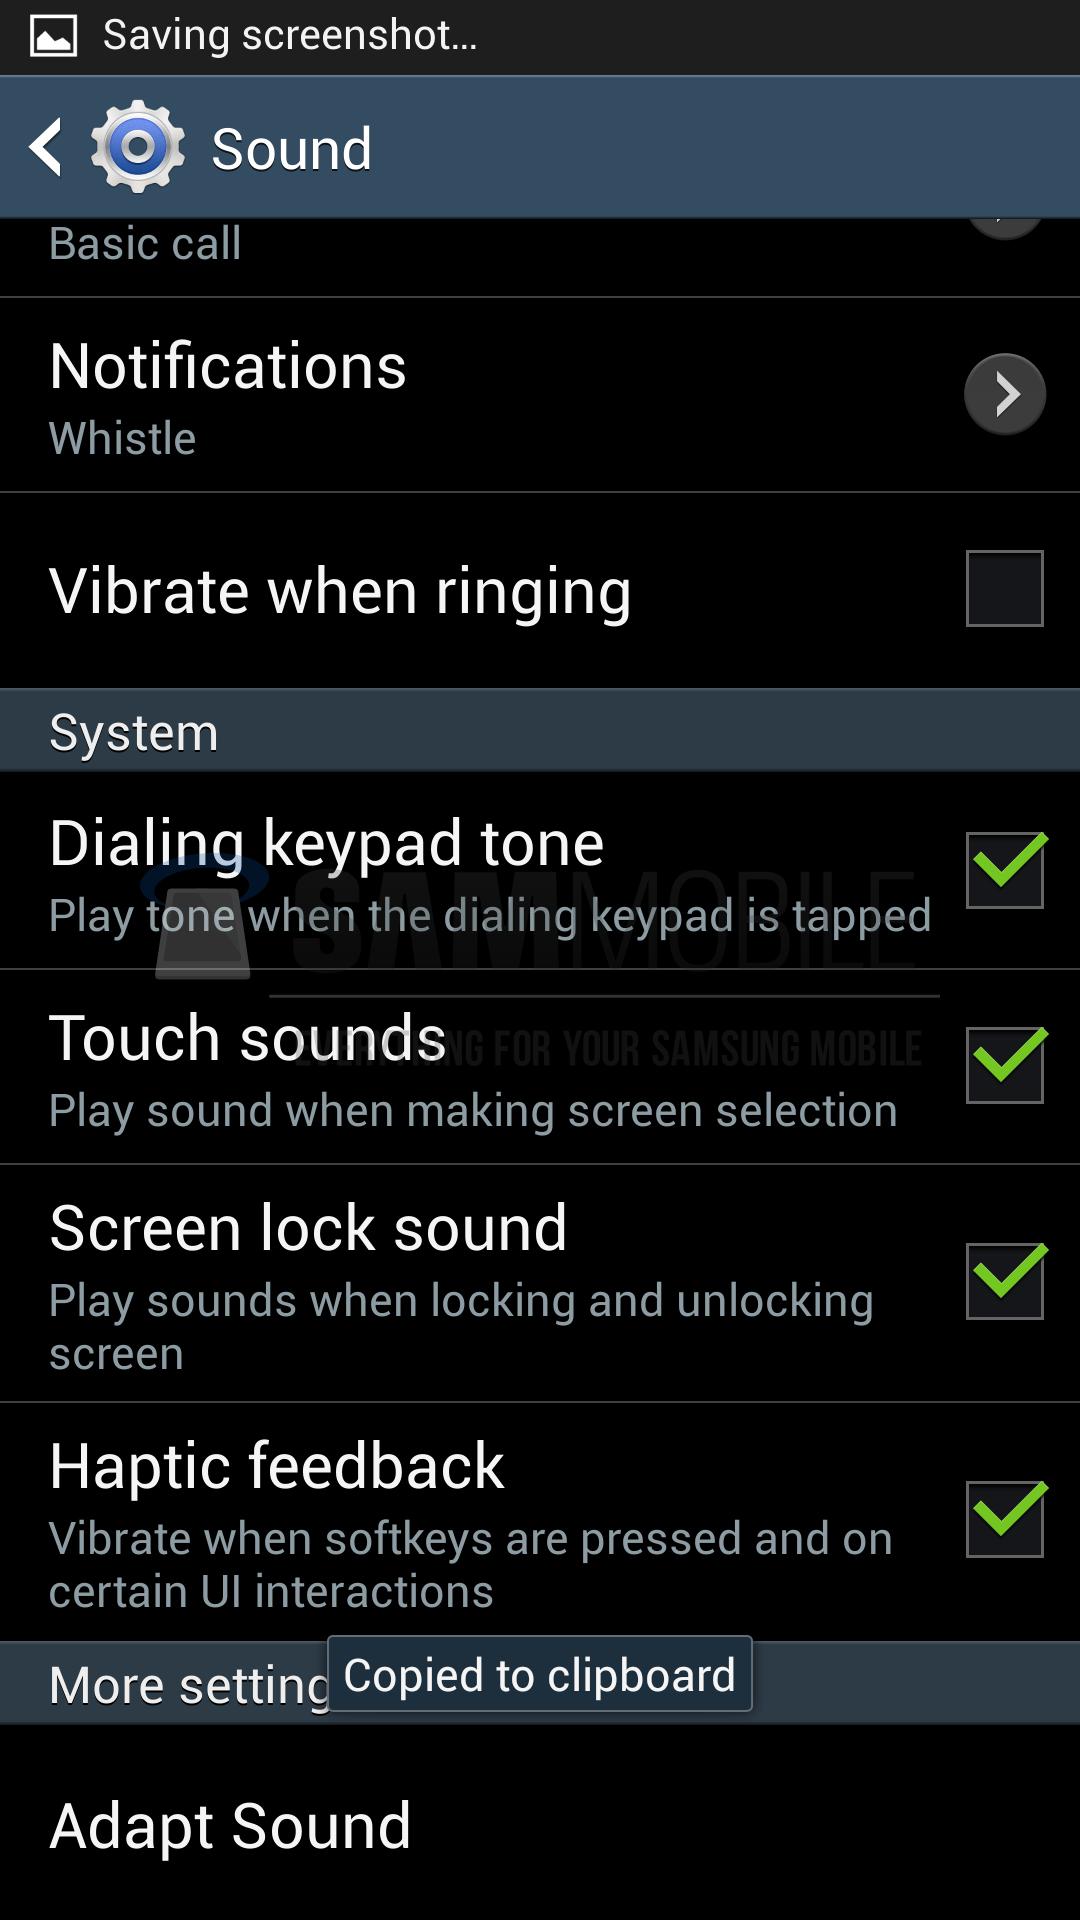 Samsung Galaxy S4: User Interface Walkthrough